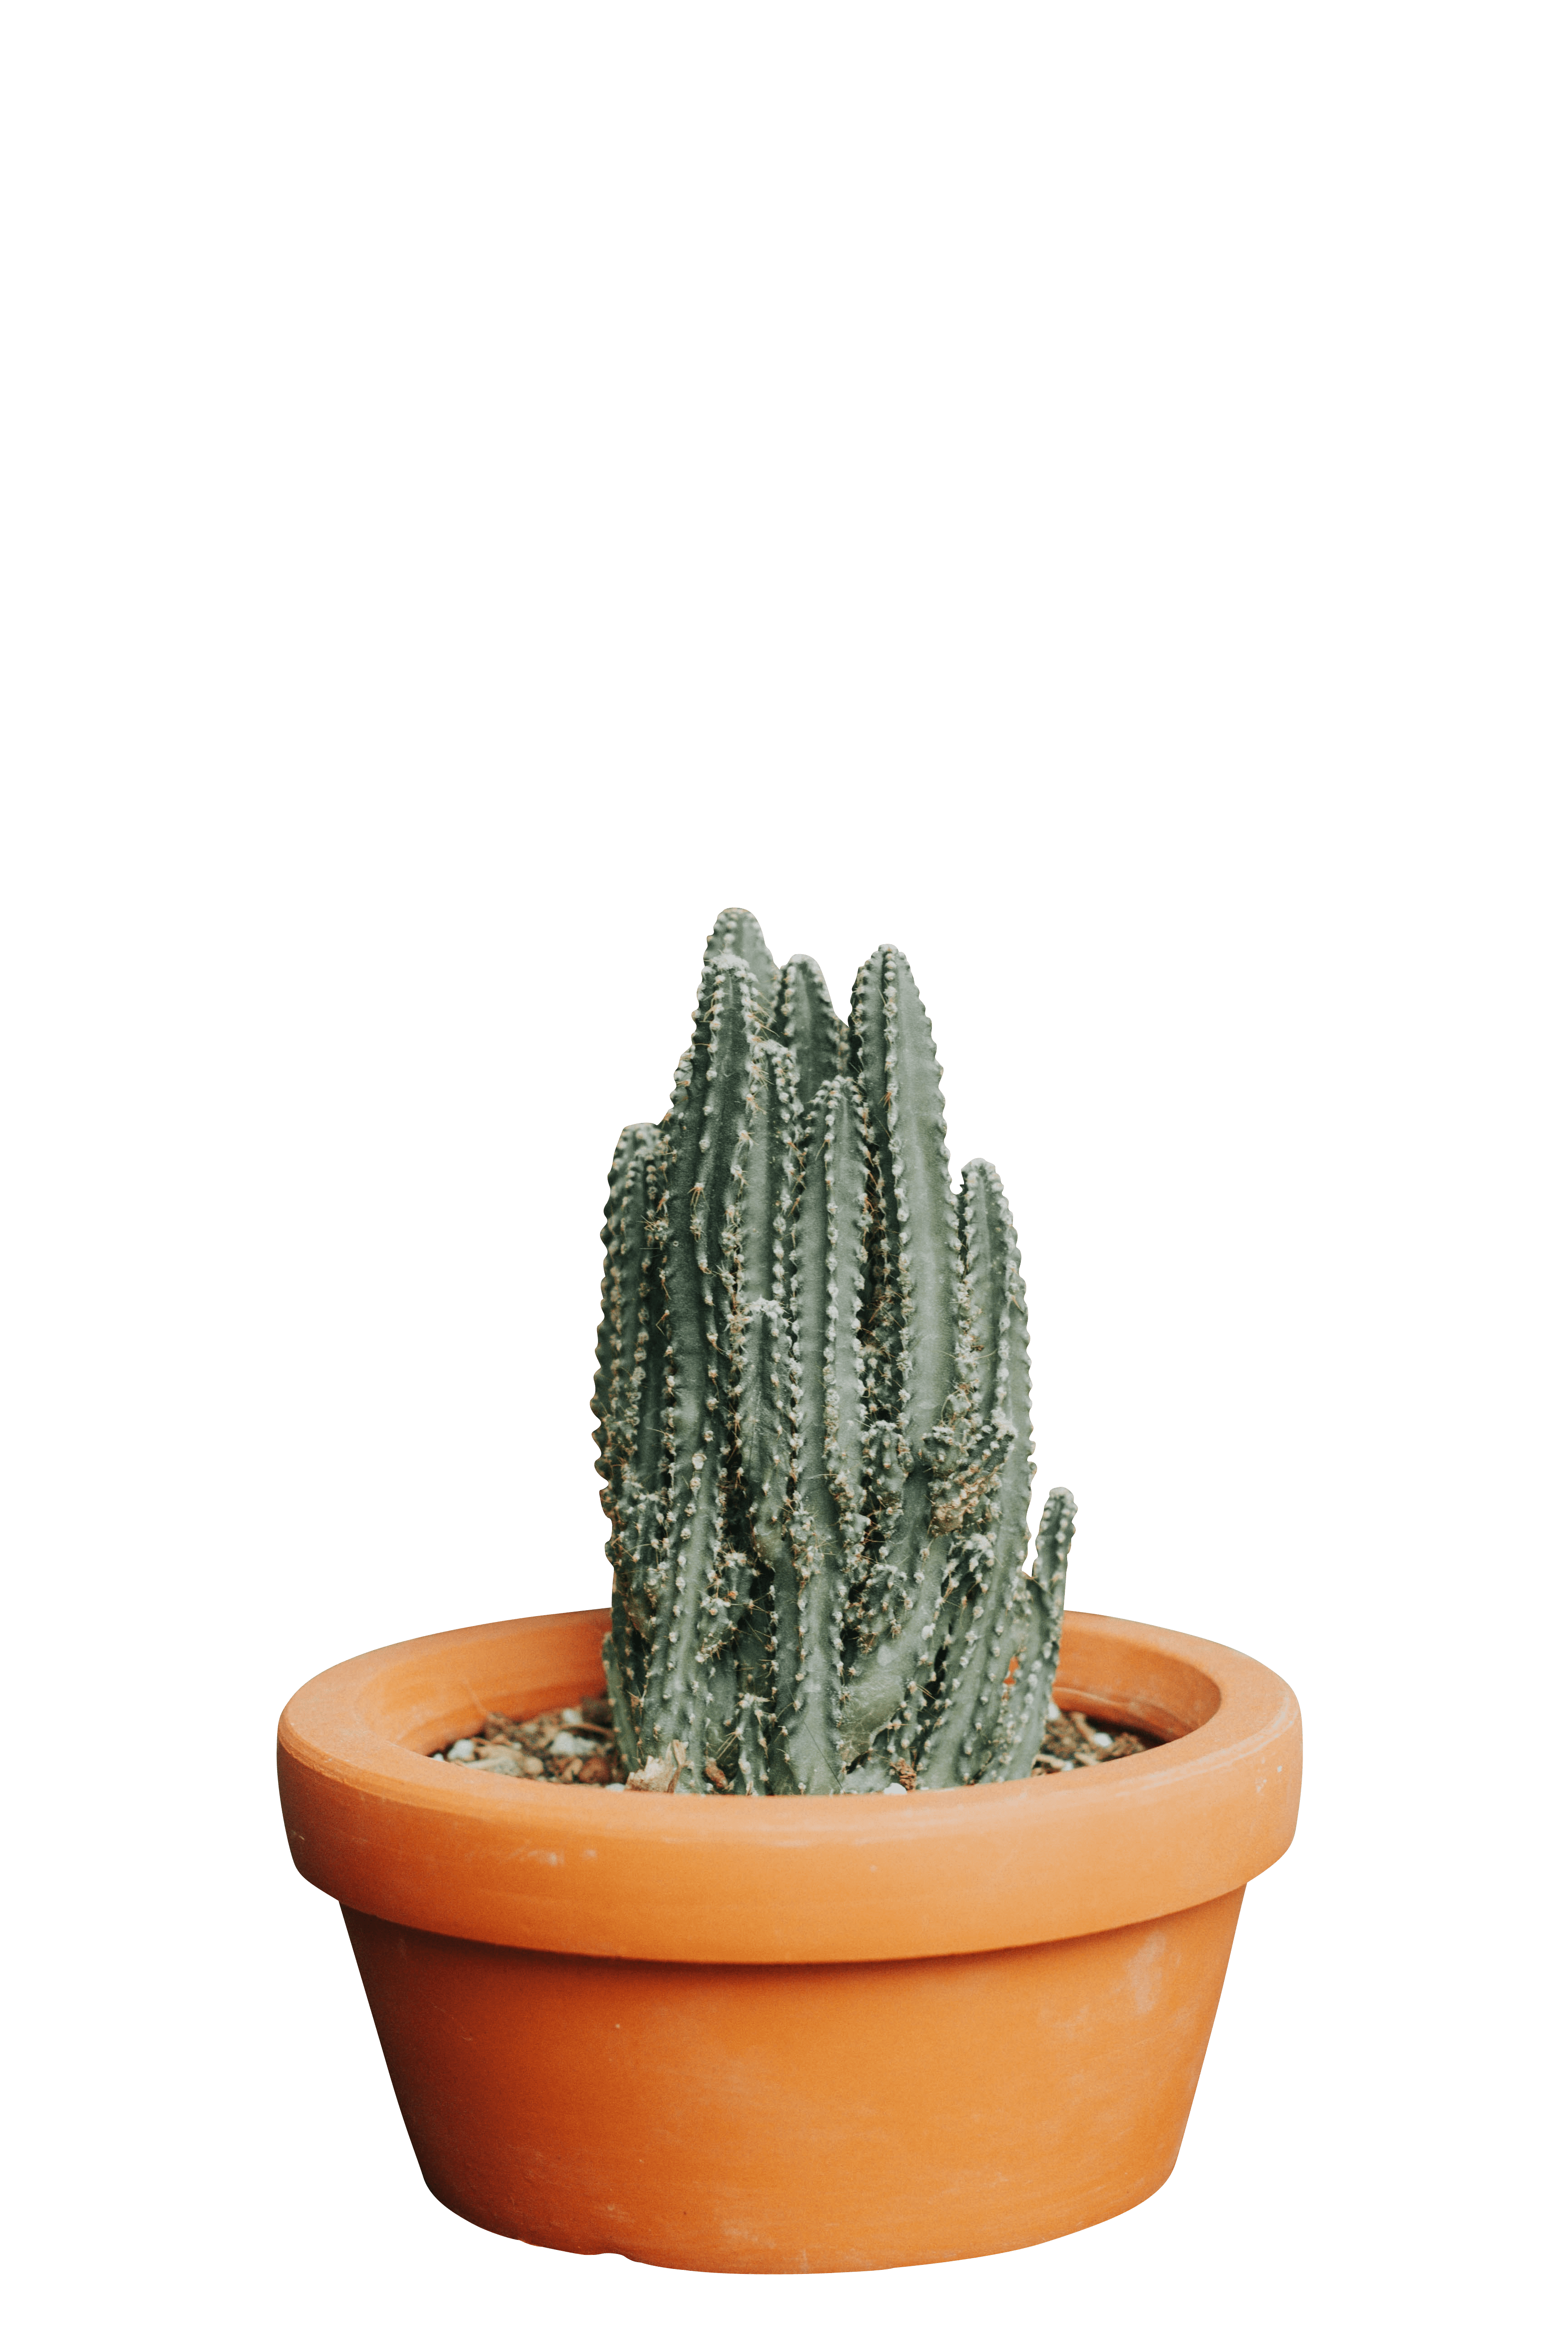 Cactus euphorbia ingens plants transparent background.png